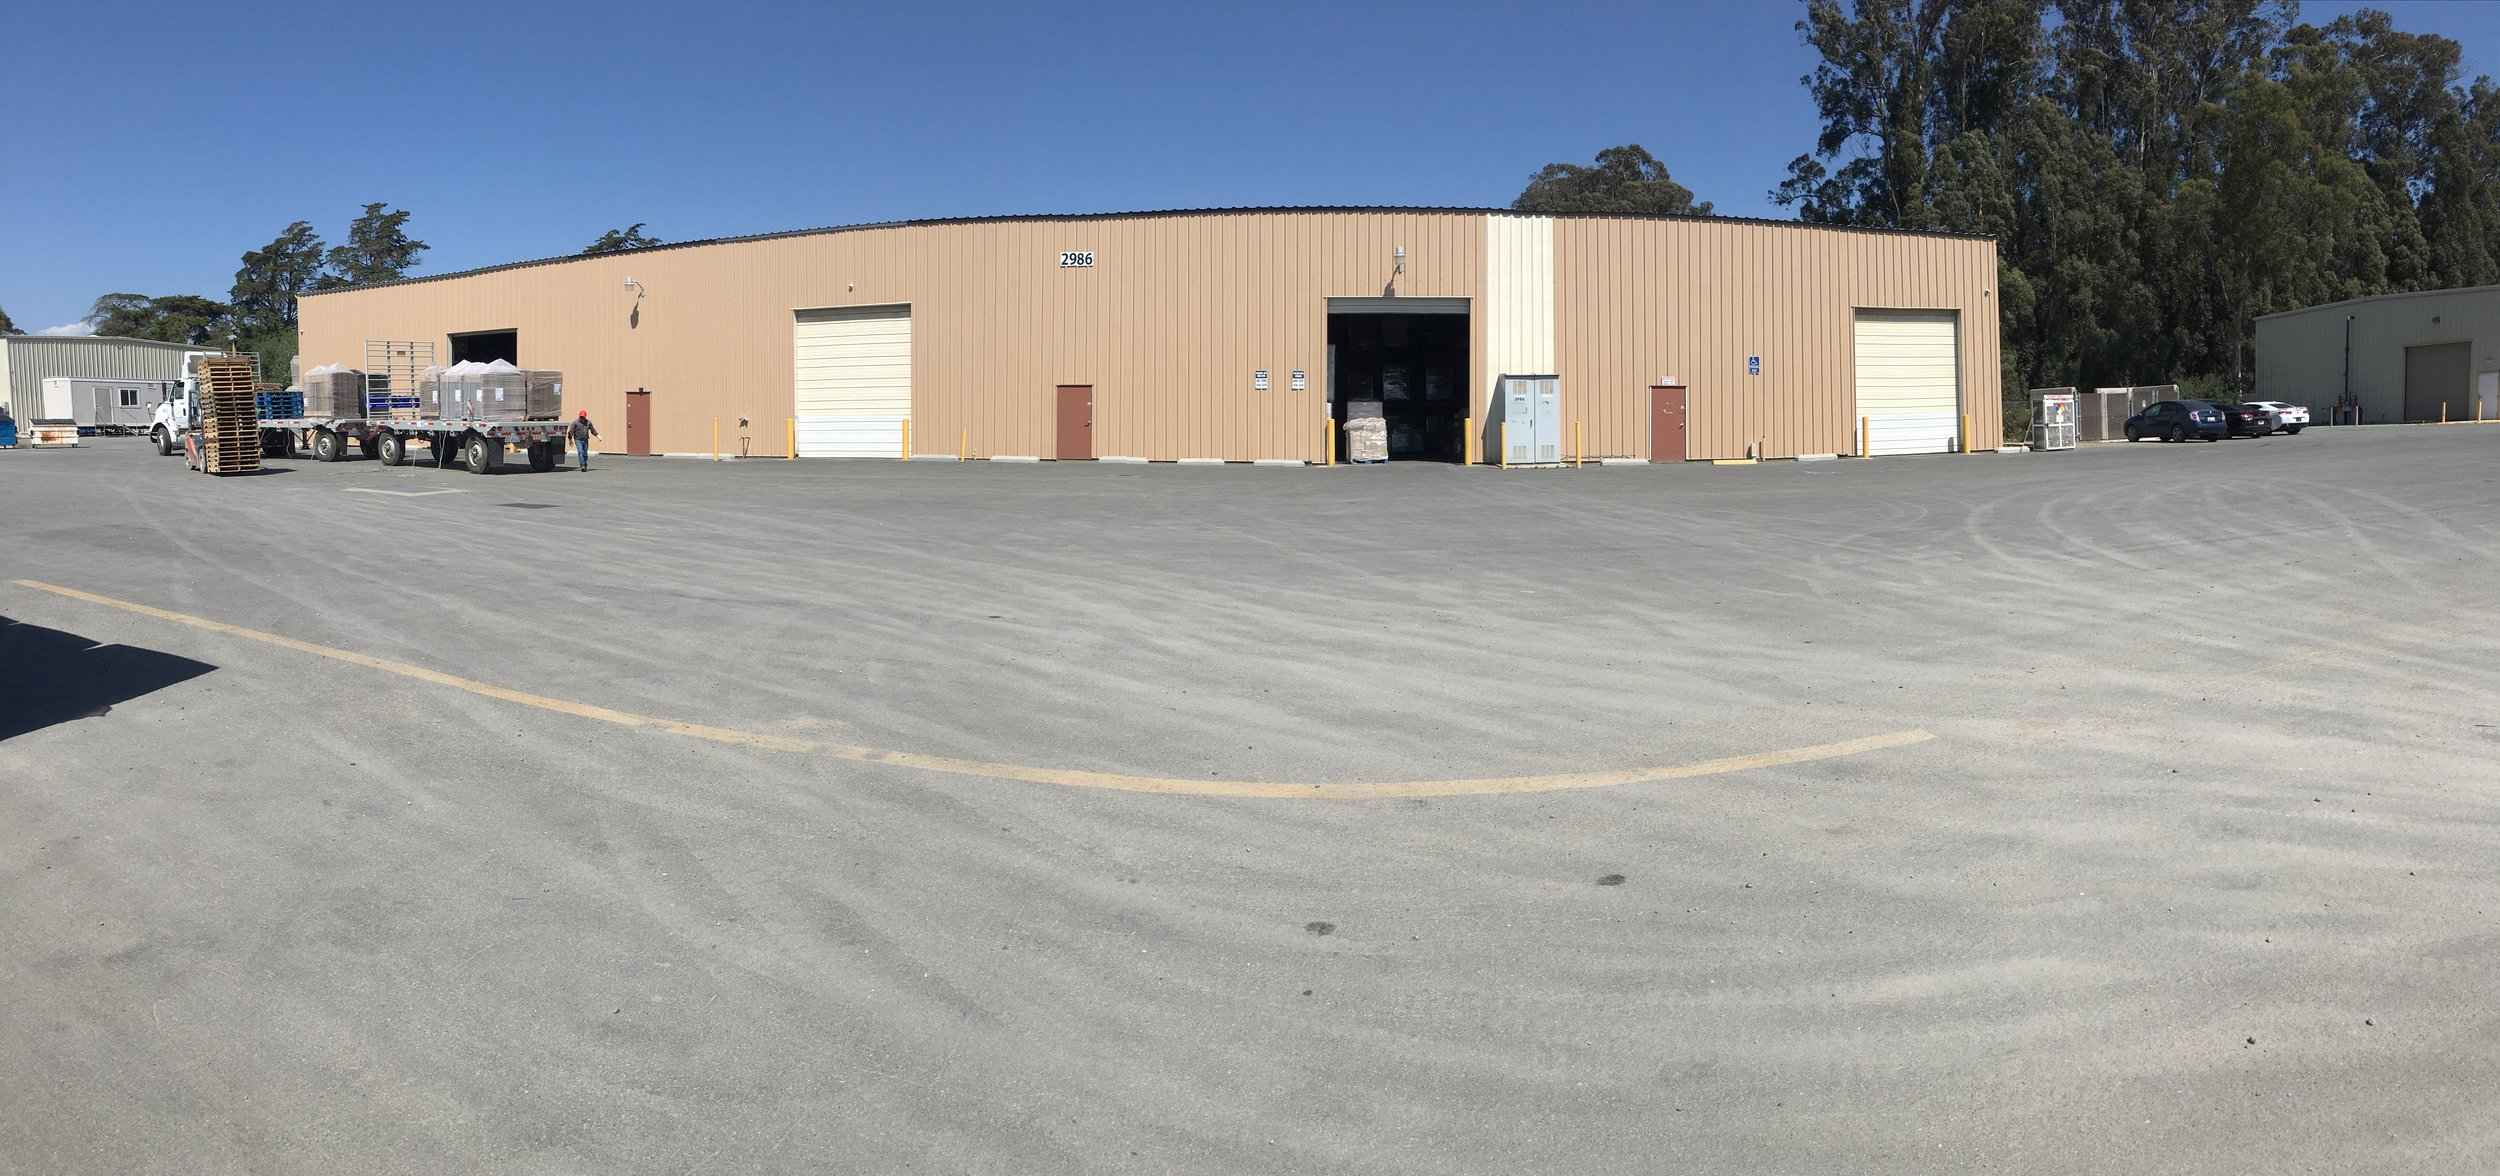 Santa maria yard - 2986 Industrial ParkwaySanta Maria, CA 93455Phone: 805.349.8534Fax: 805.349.8844